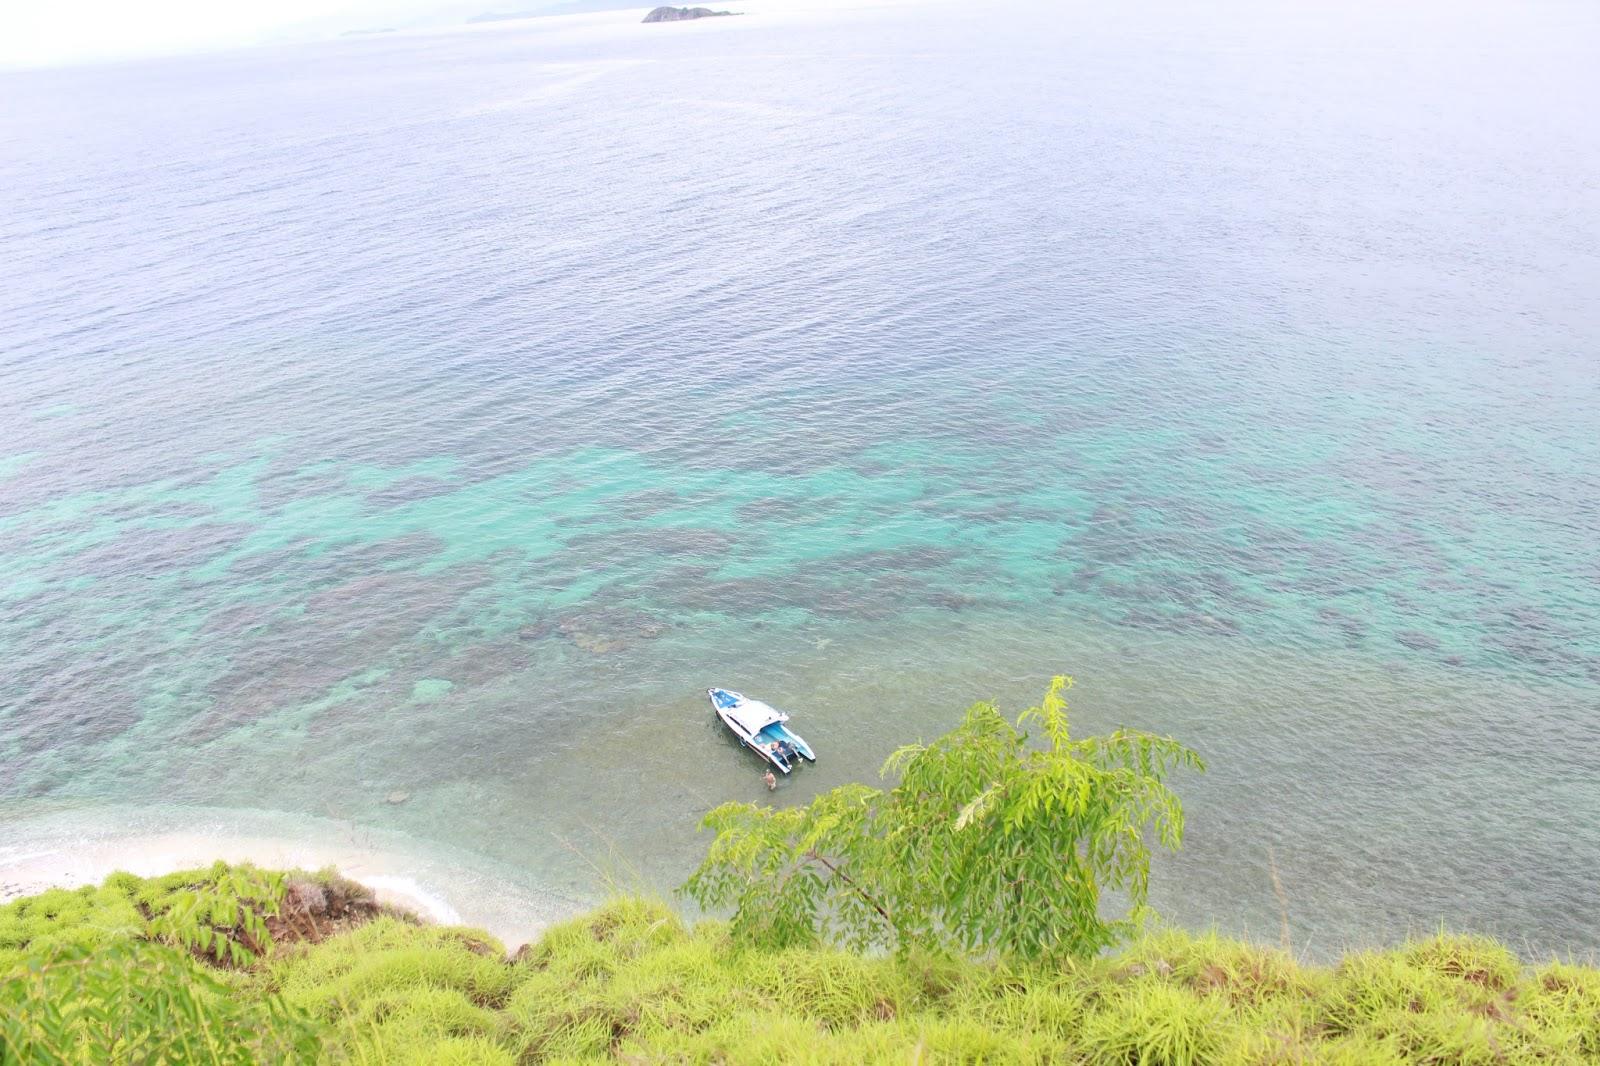 Sensasi Nginap Semalam Cottage Tengah Laut P Tumbak Baling2 Assalamu